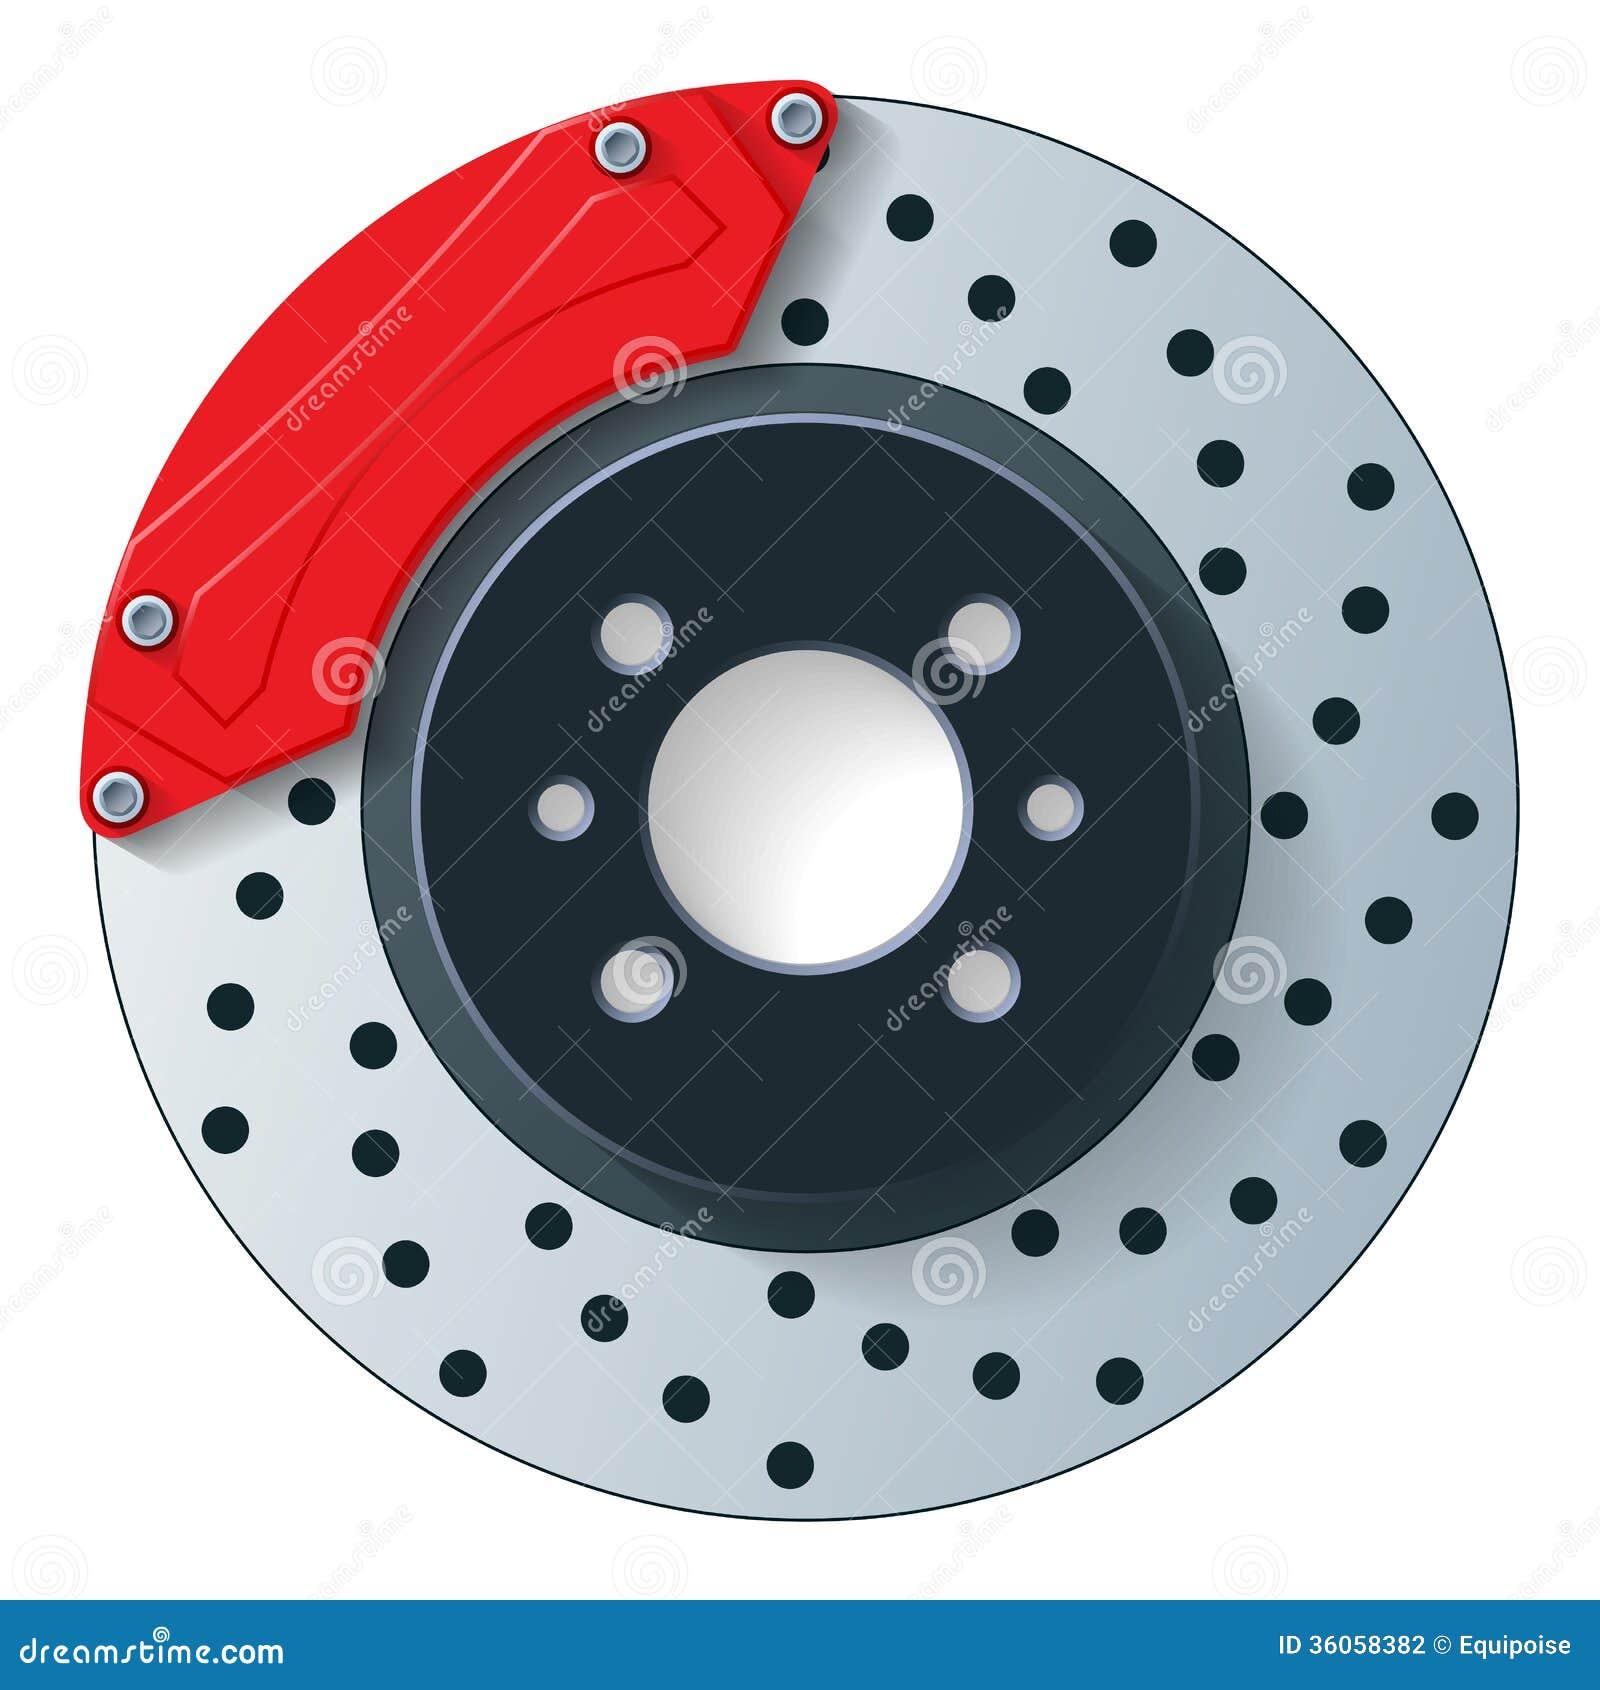 CARX  Auto Repair Oil Change Tires Brakes Scheduled